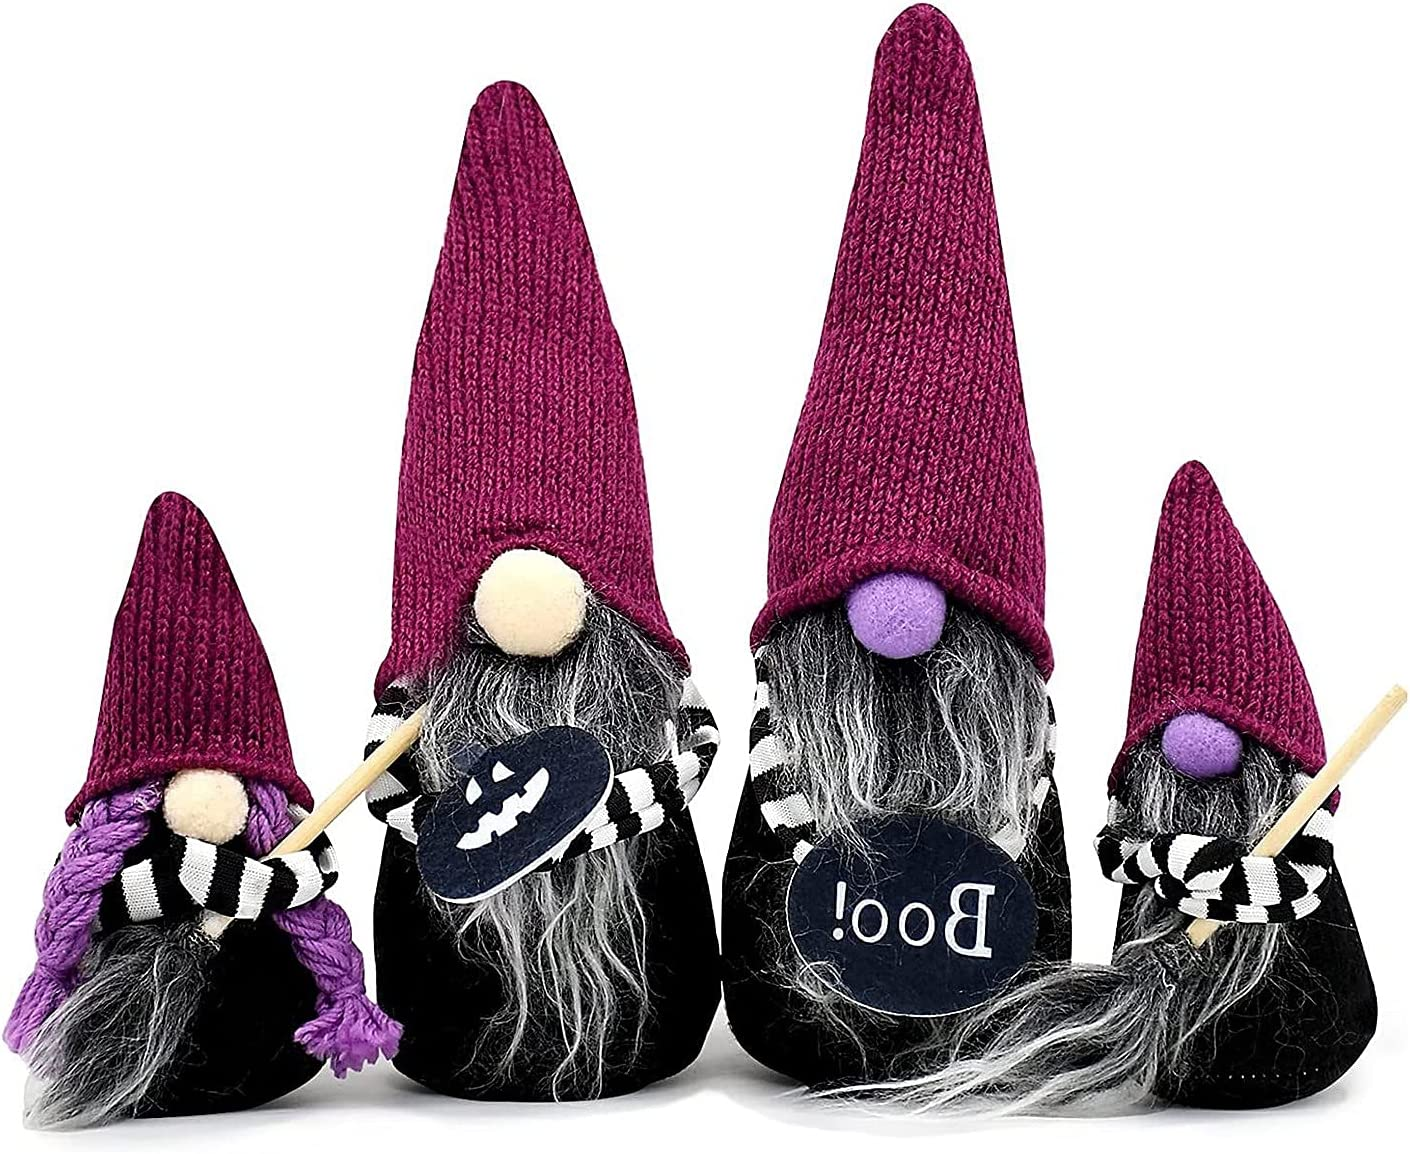 Halloween Decor Under blast sales Farmhouse Witch Sale SALE% OFF Plush Gnomes For Tier